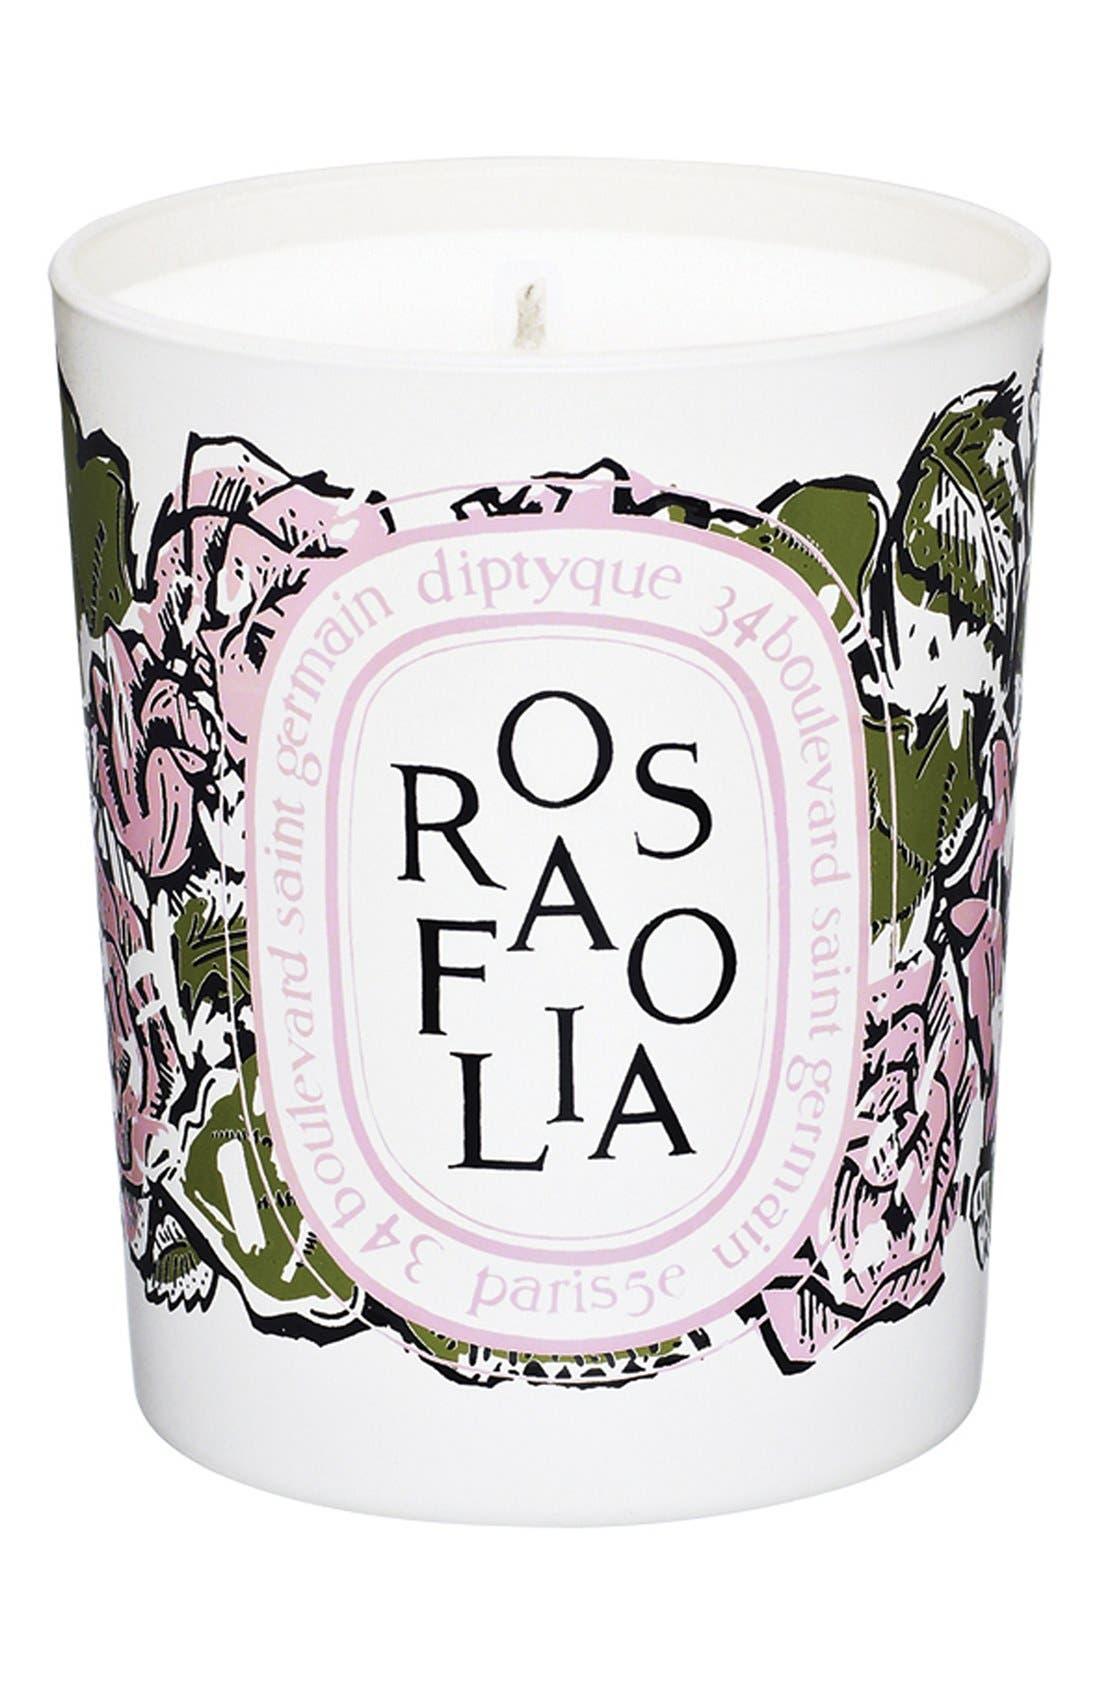 DIPTYQUE, 'Rosafolia' Candle, Main thumbnail 1, color, 000